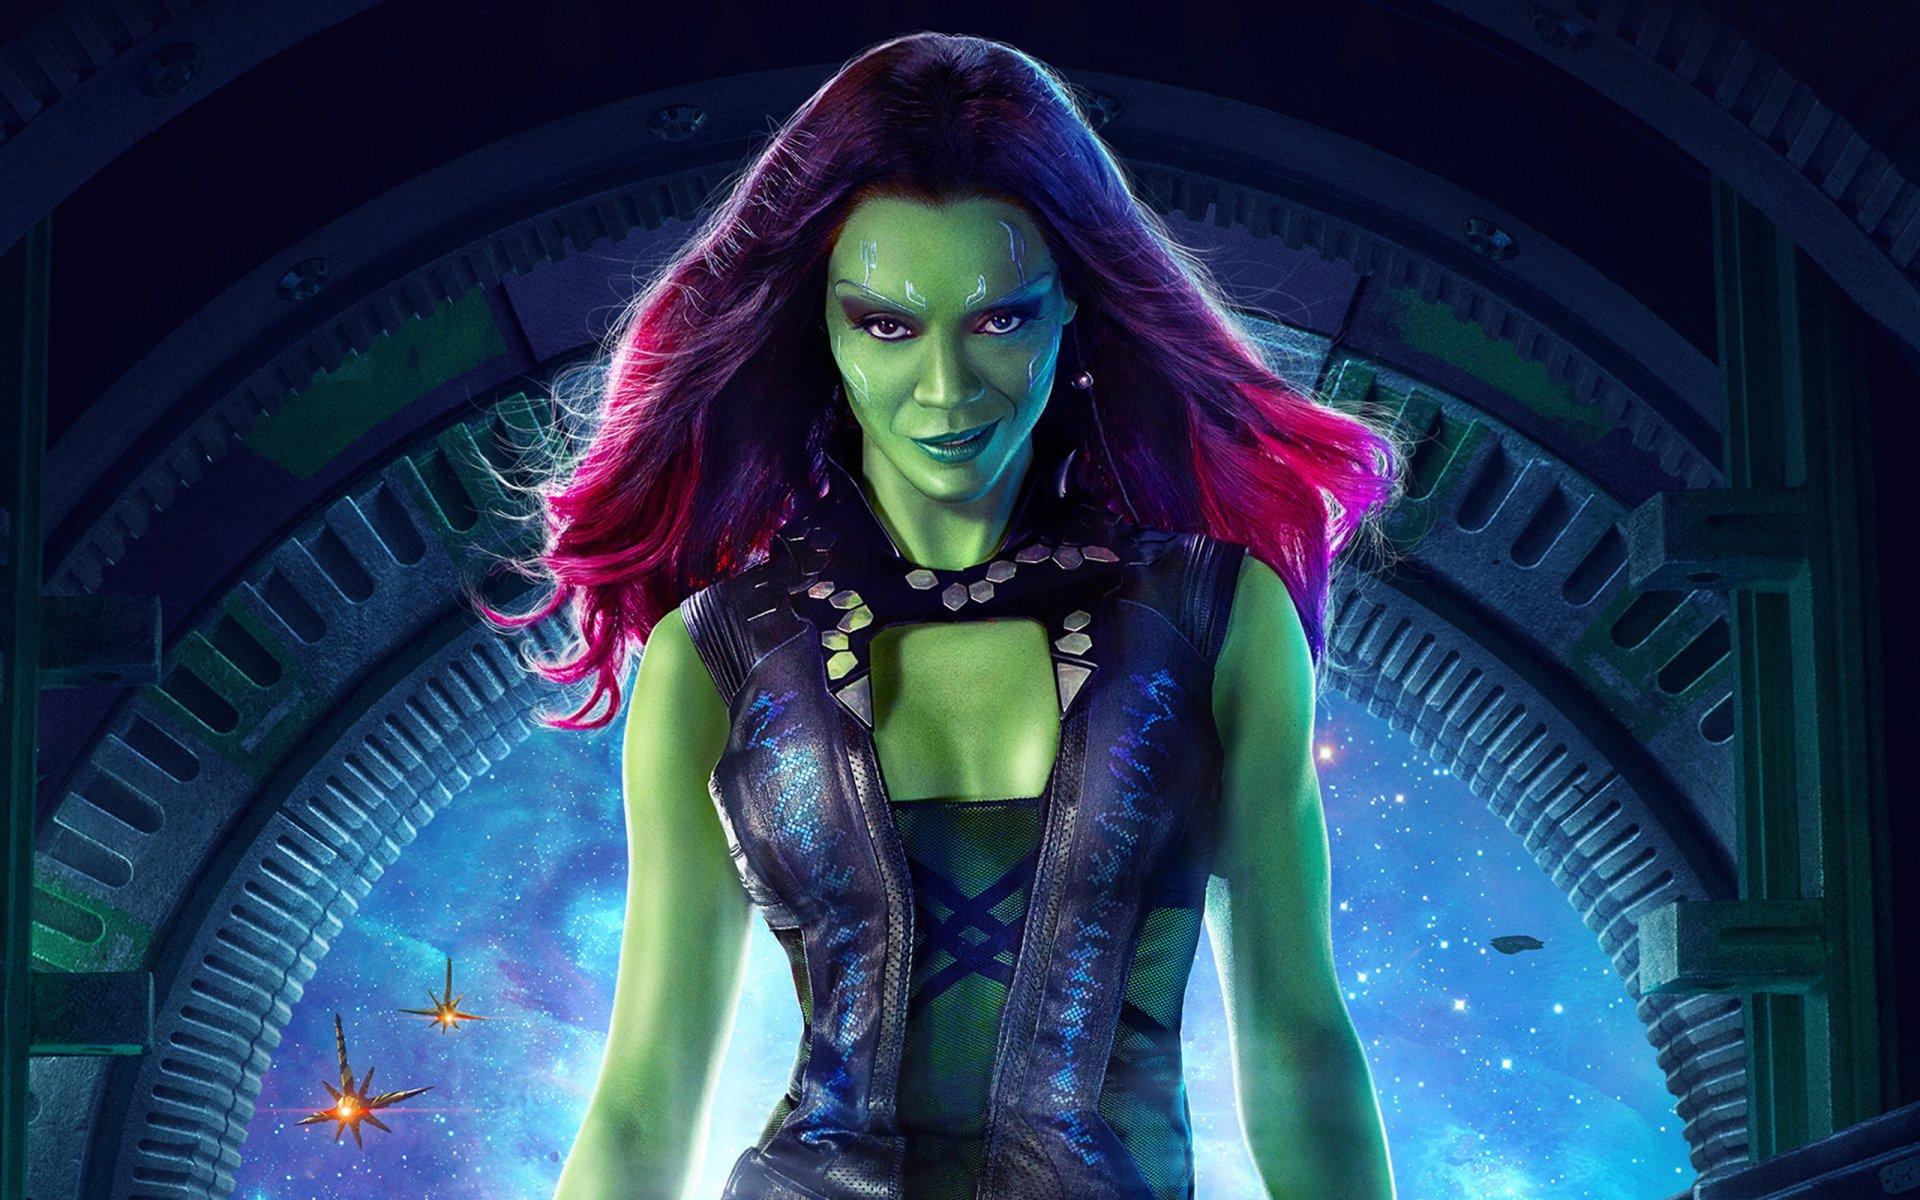 Movie - Guardians of the Galaxy  Zoe Saldana Gamora Wallpaper